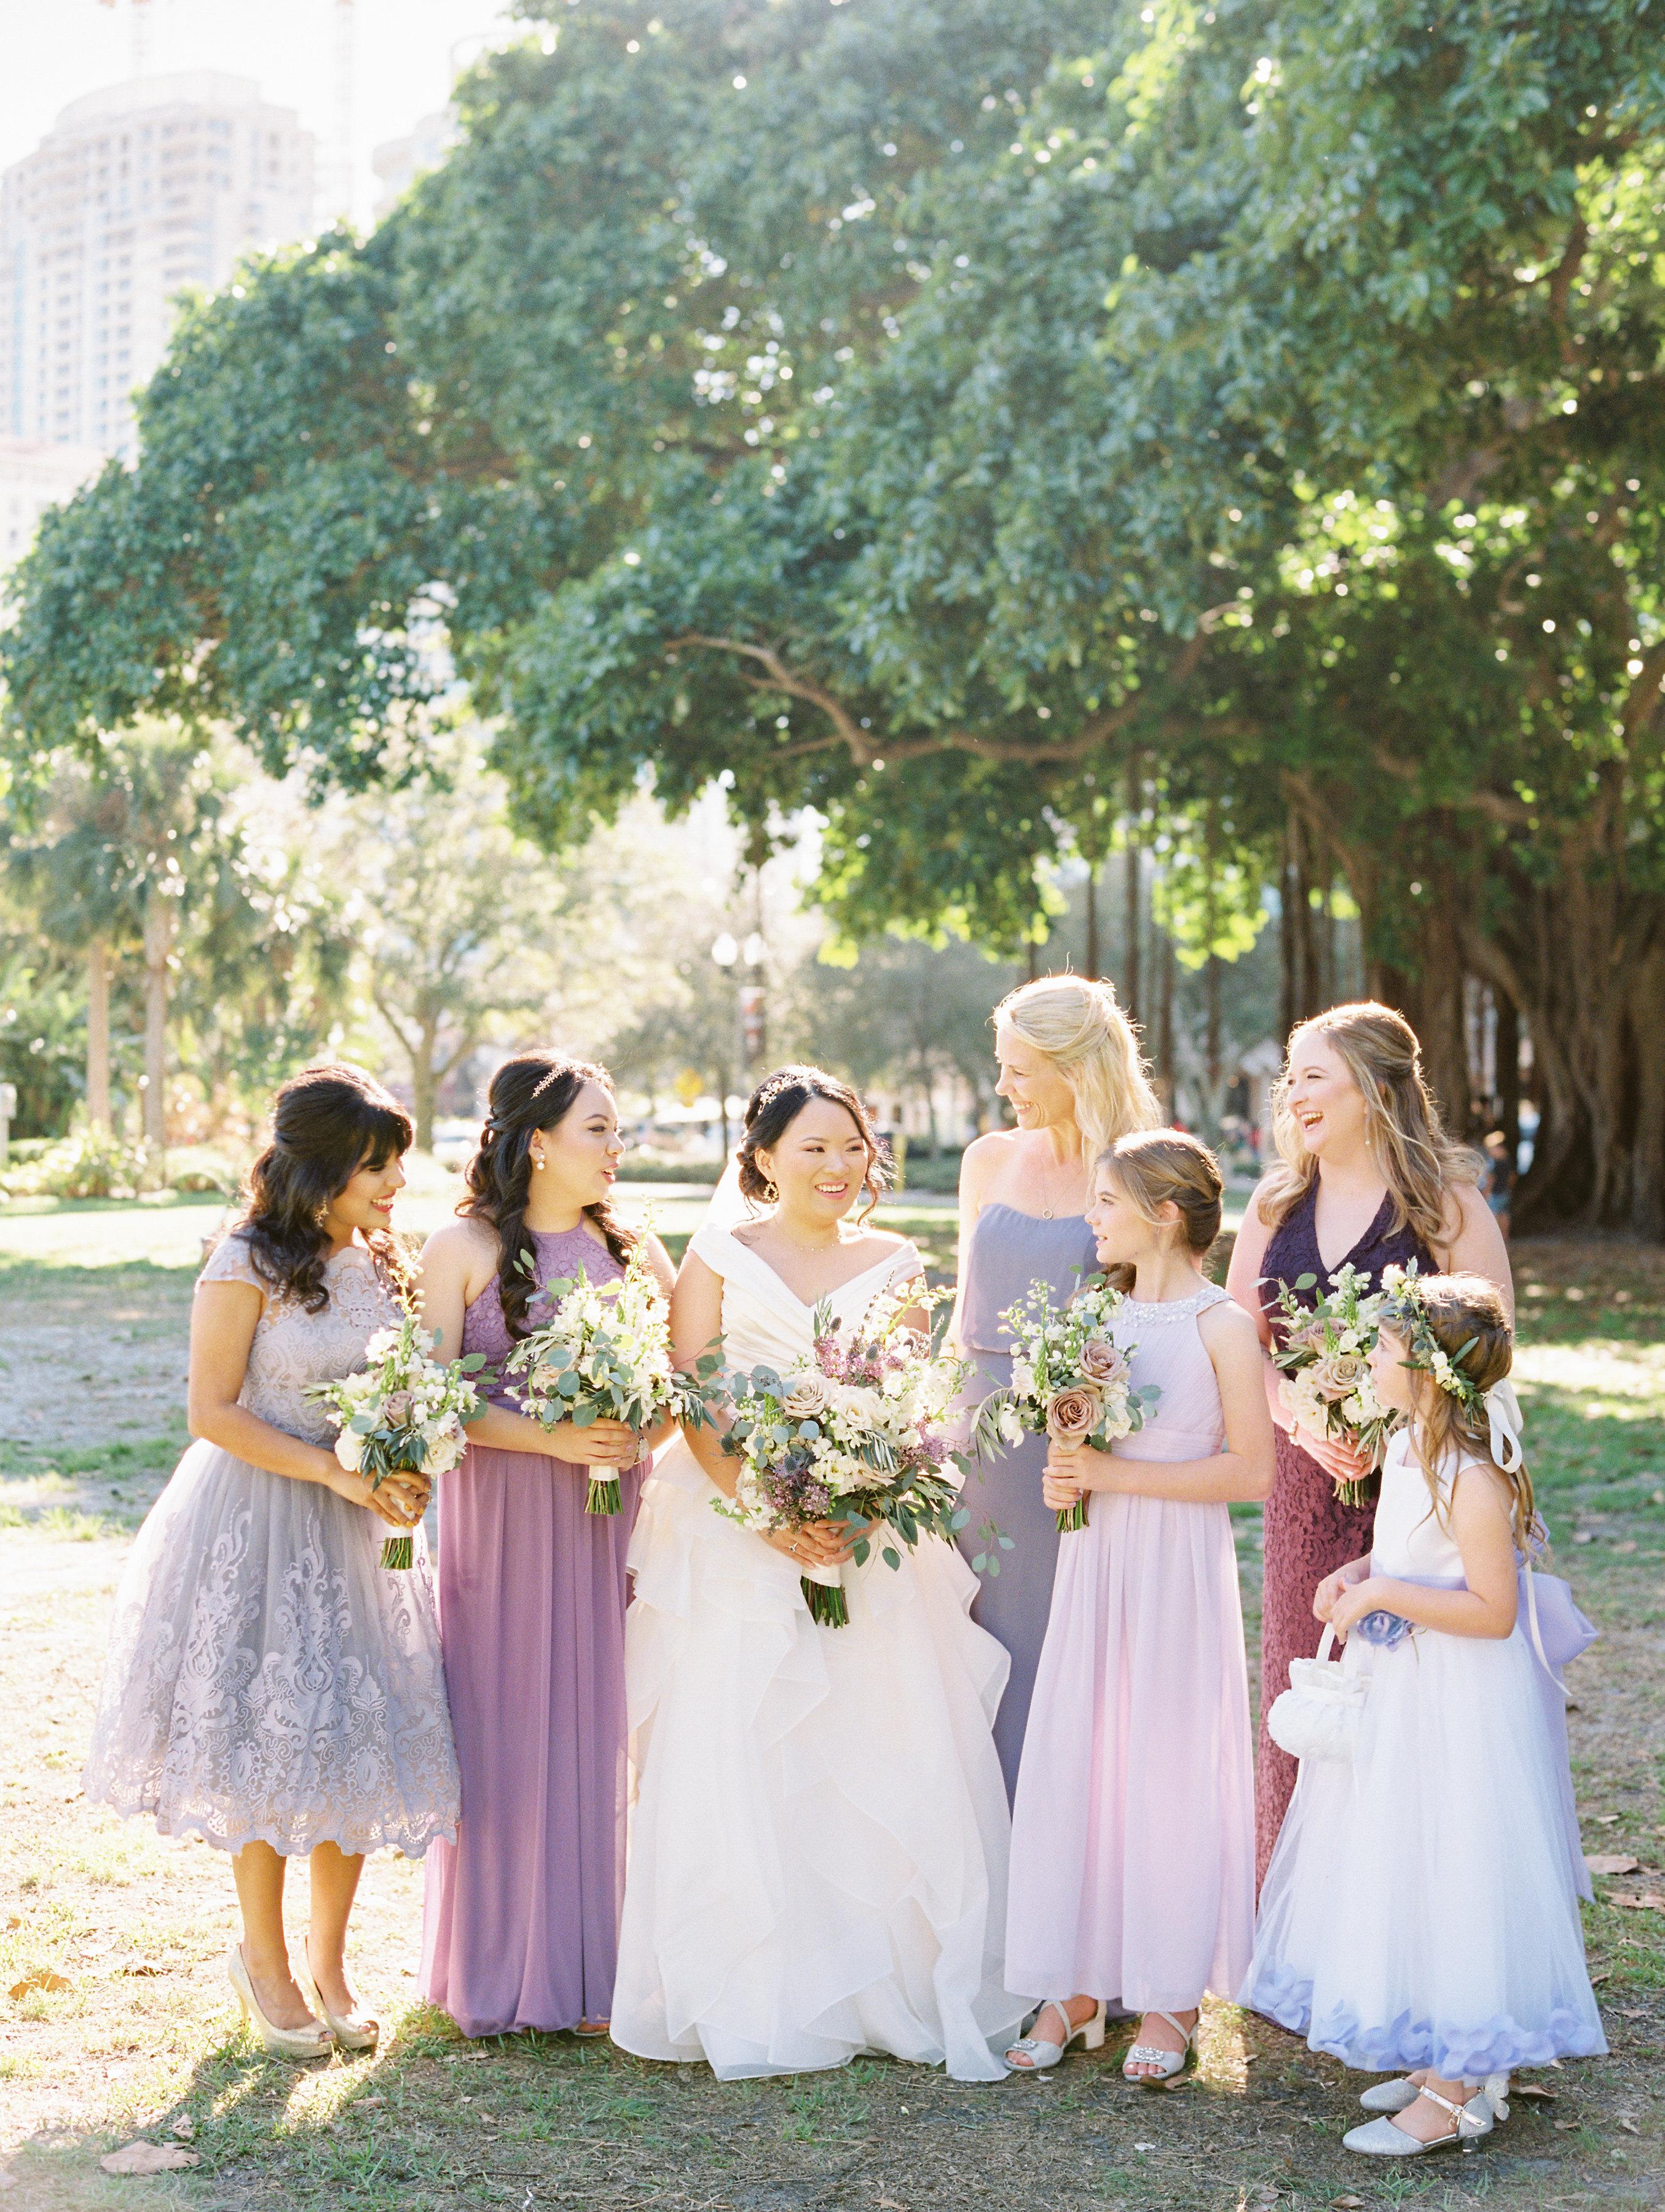 Bridesmaids in mismatched purple dresses